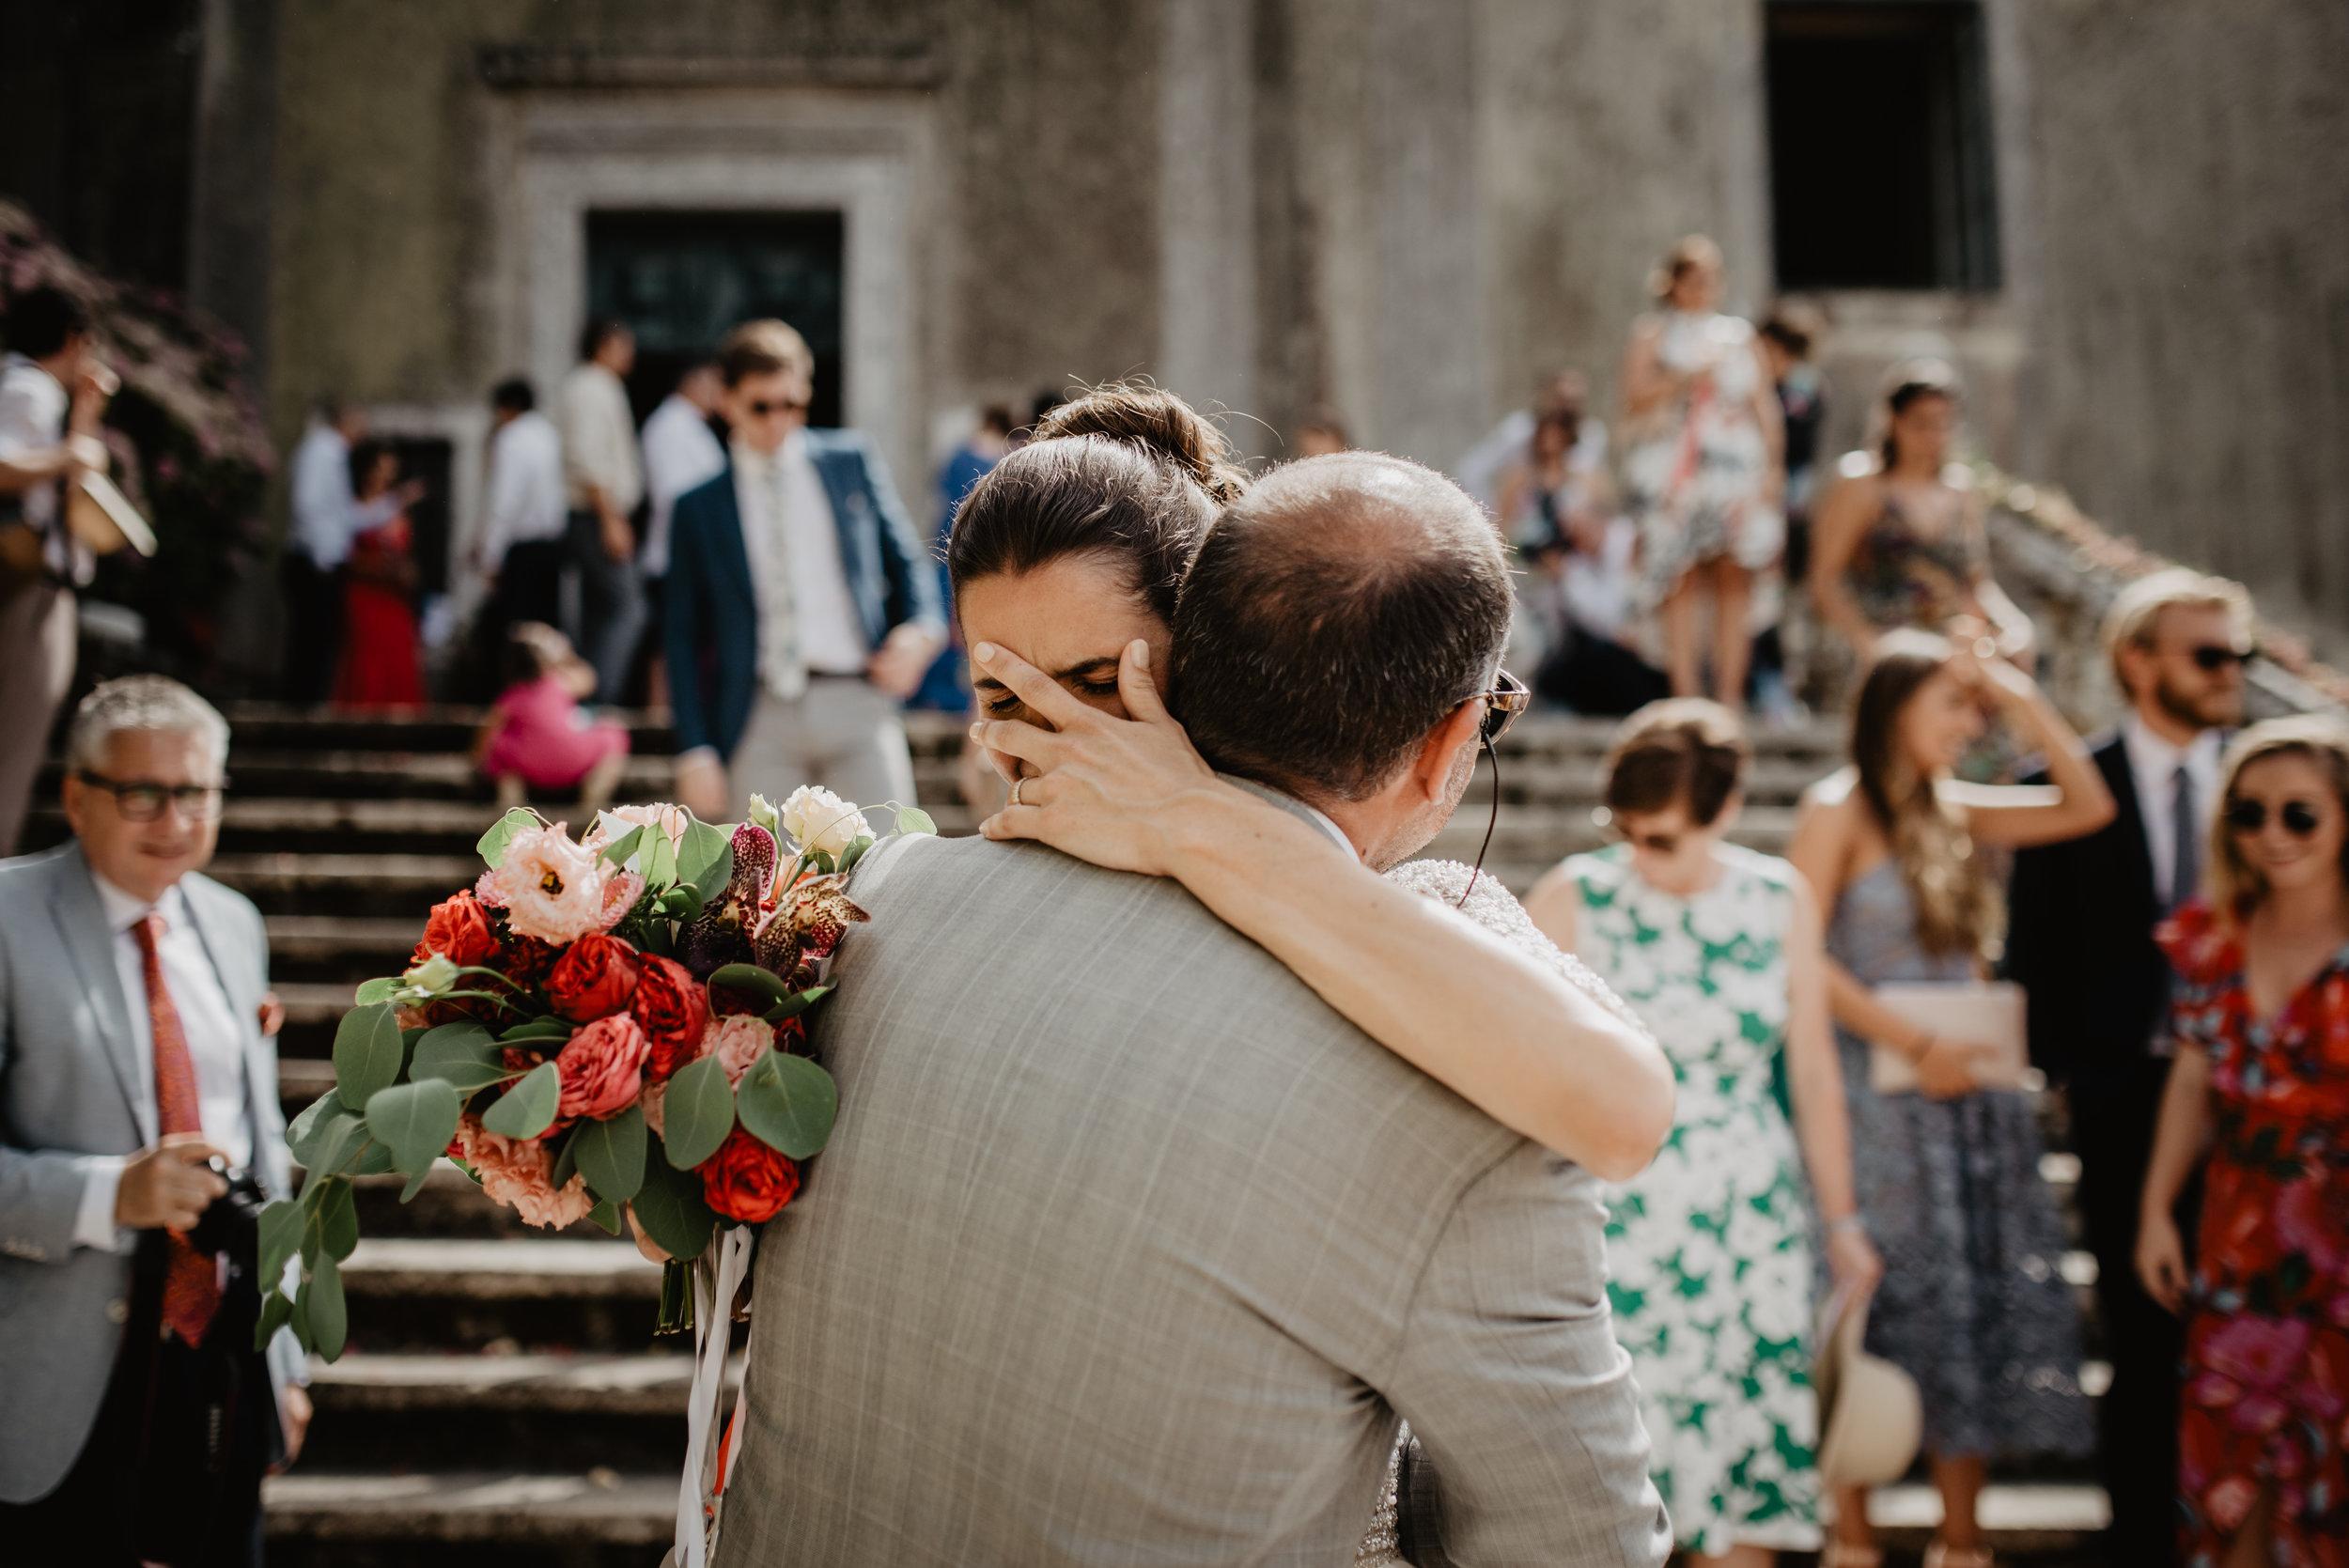 Lapela-photography-wedding-sintra-portugal-68.jpg